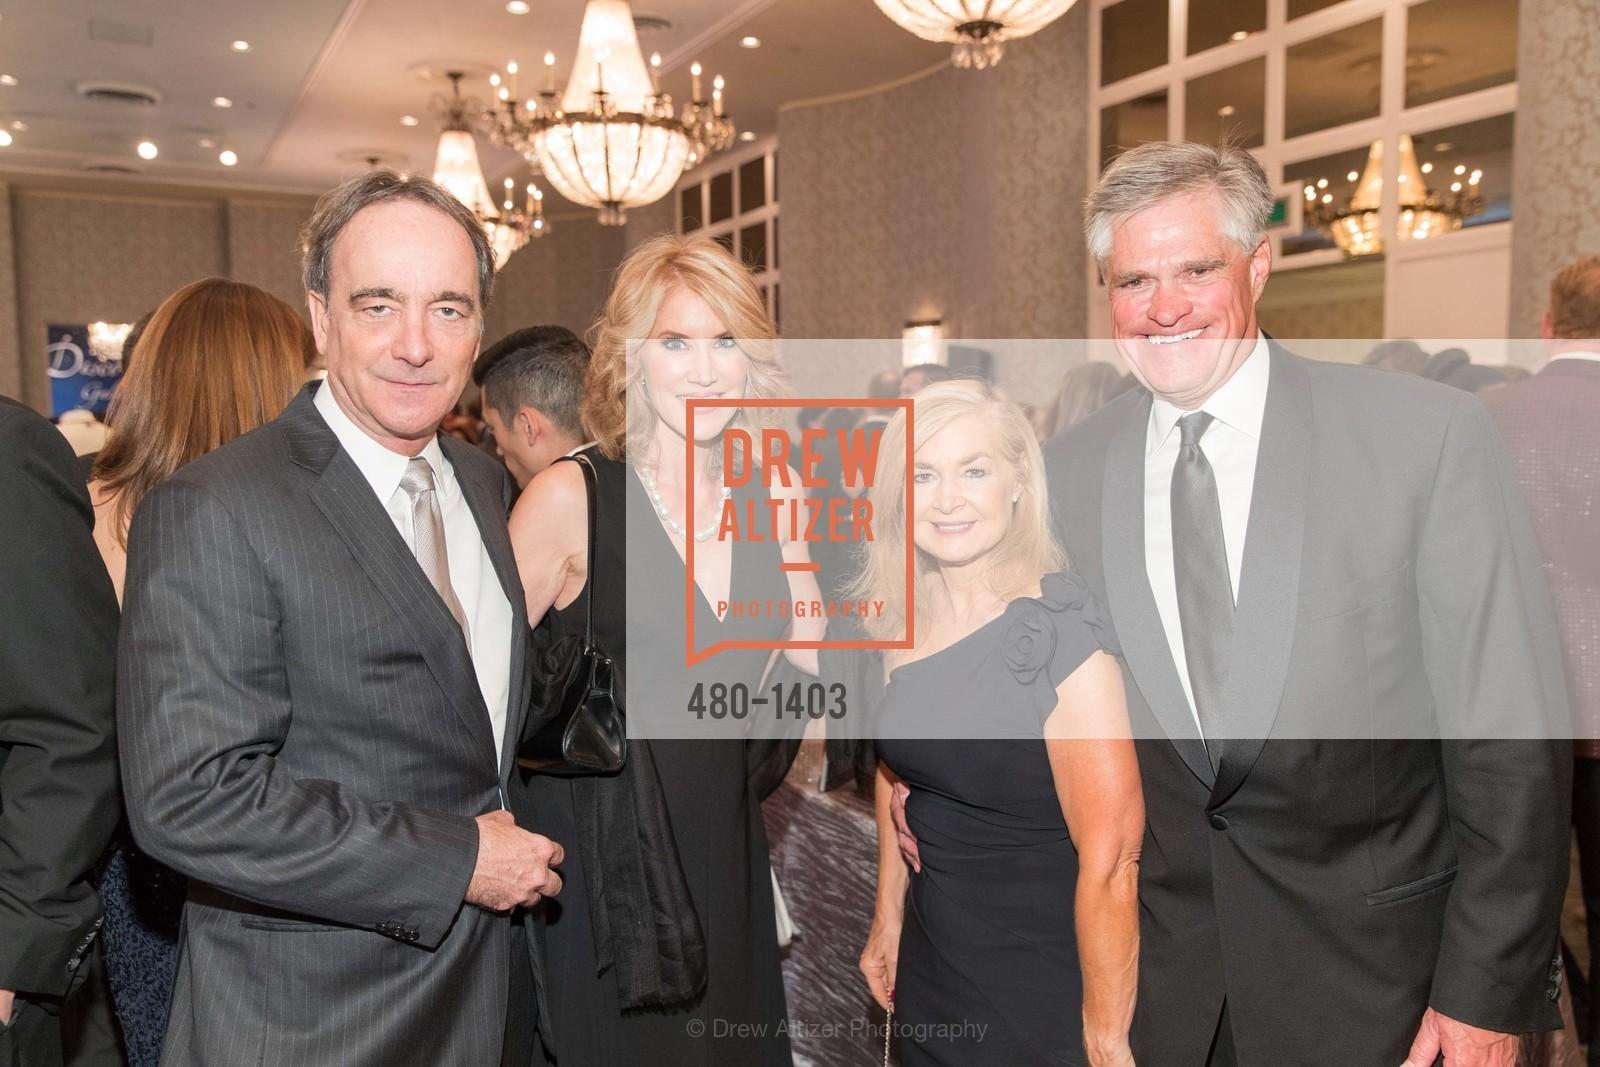 Denny Lamfear, Karen Lamfear, Lynne Edminster, Brian Atwood, Photo #480-1403